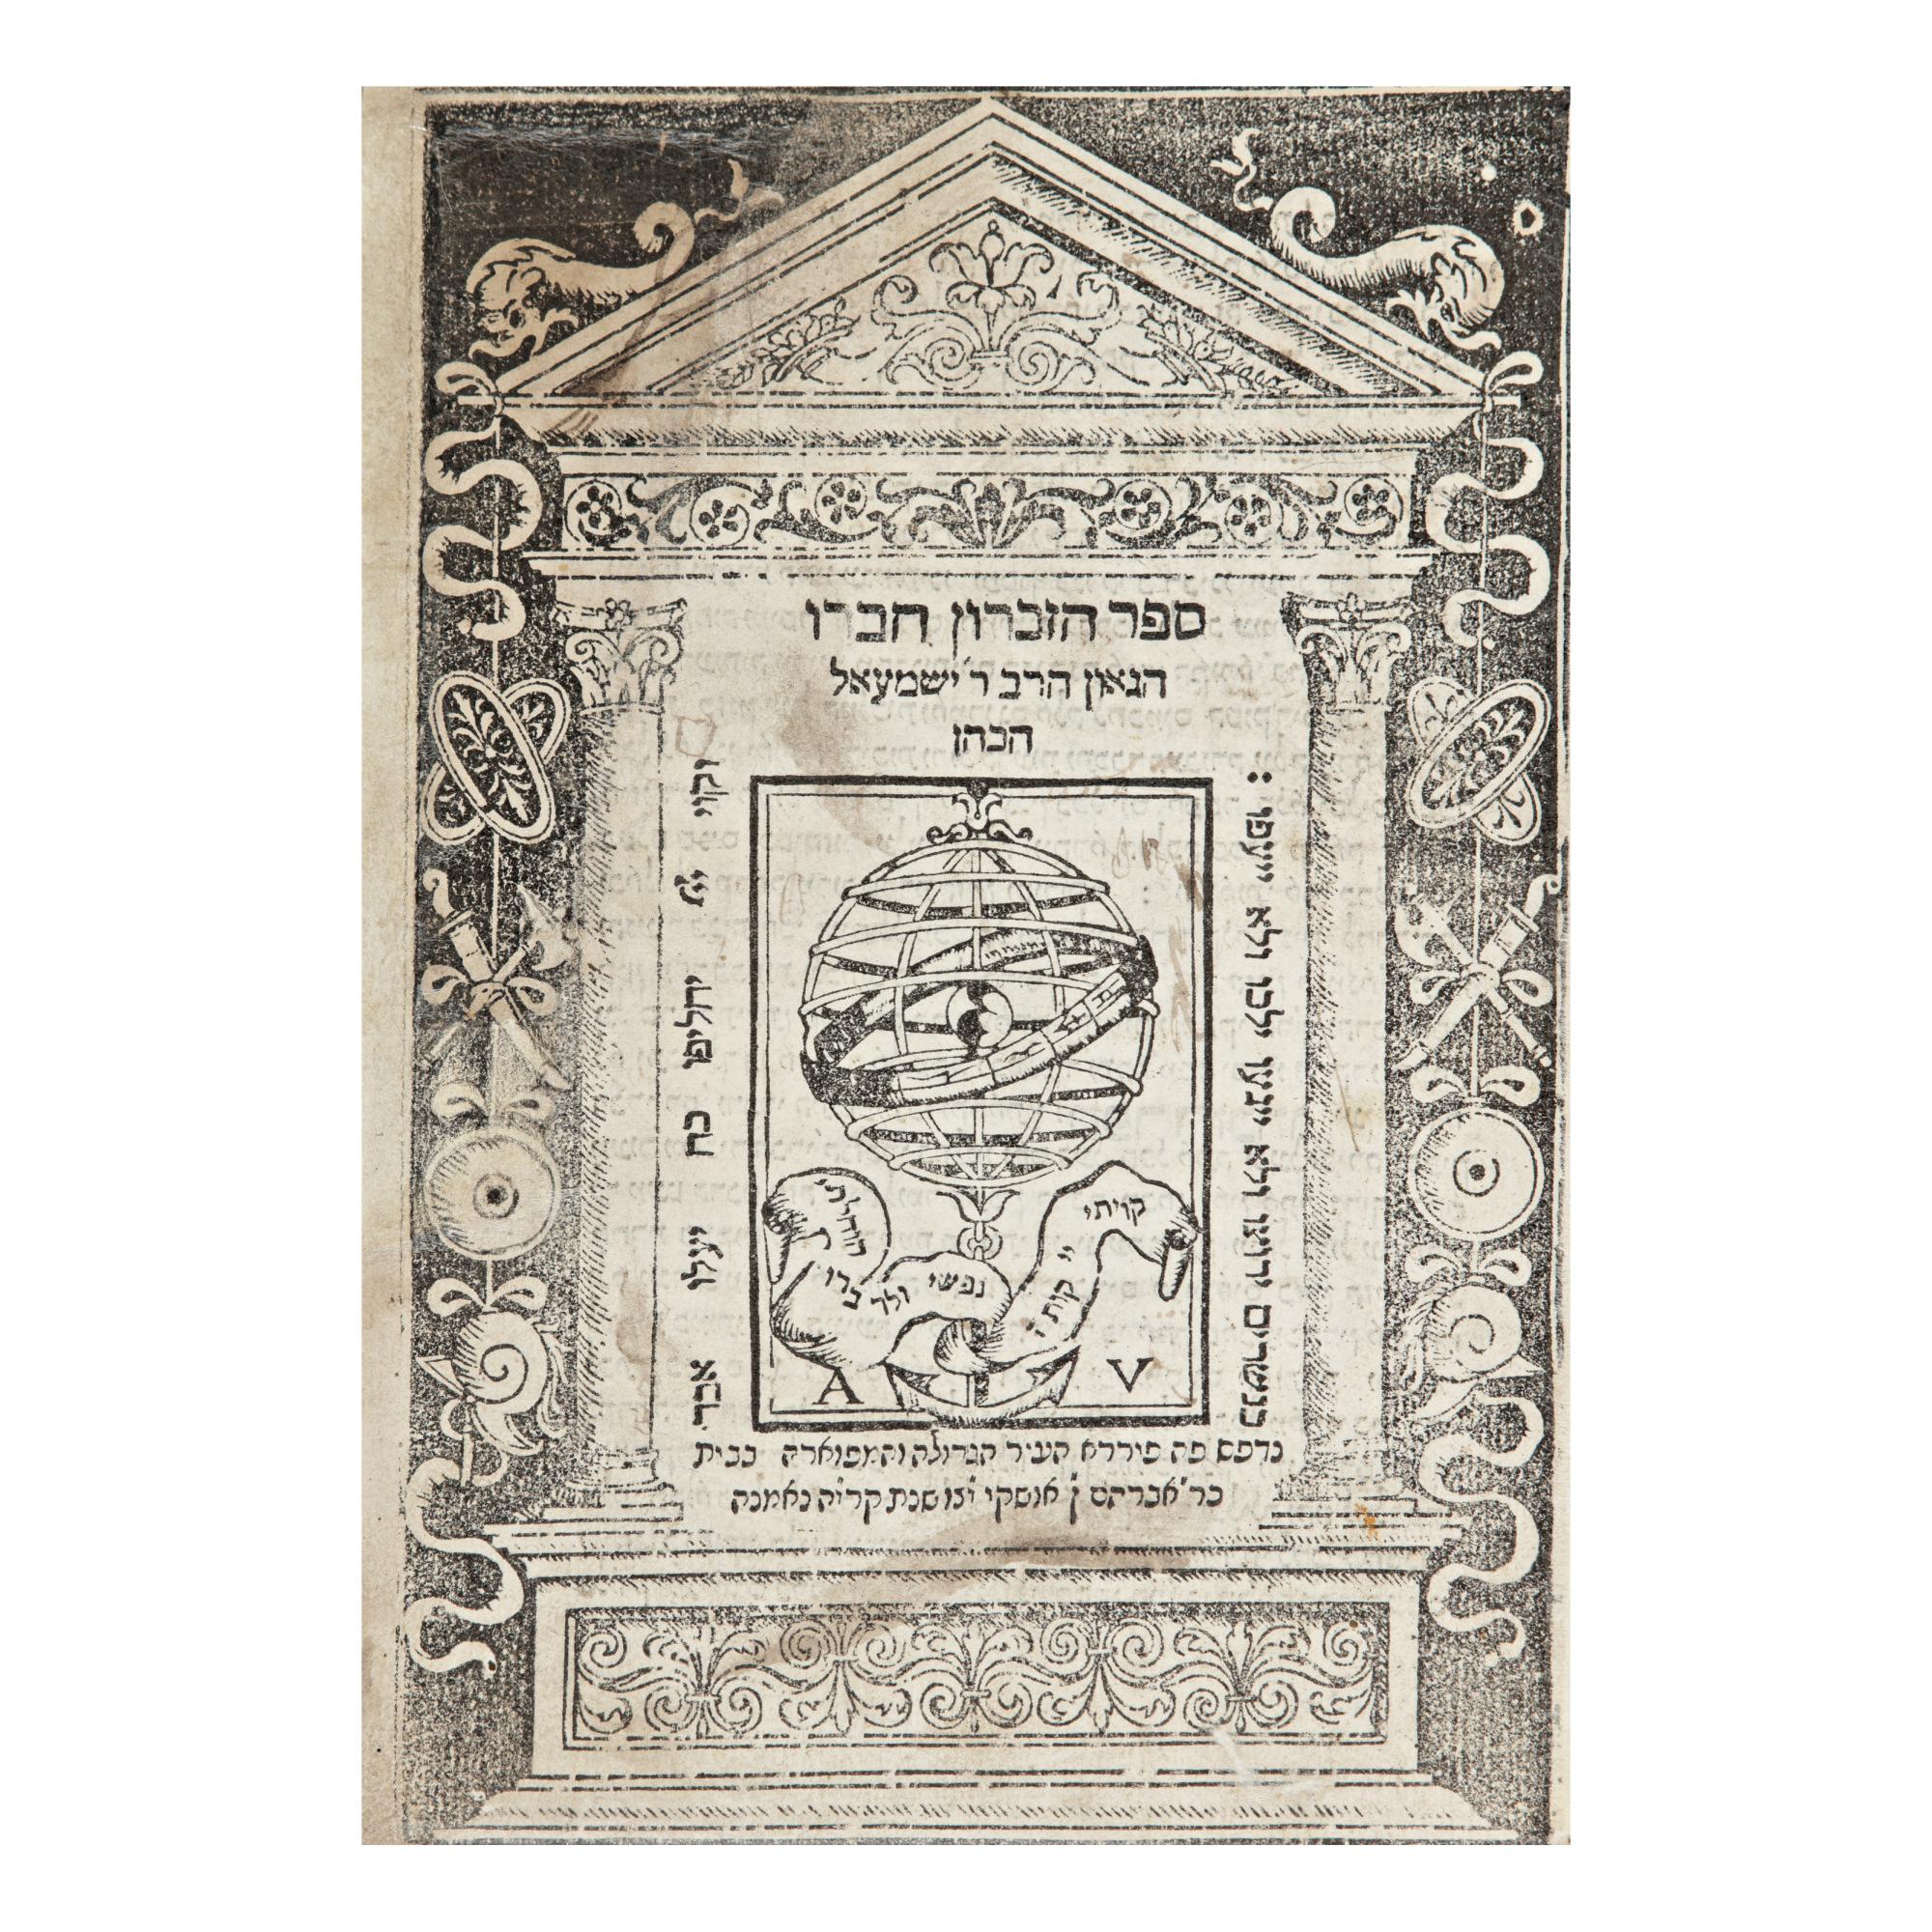 SEFER HA-ZIKKARON (HALAKHIC TREATISE), RABBI ISHMAEL HA-KOHEN TANUJI, FERRARA: ABRAHAM IBN USQUE, 1555